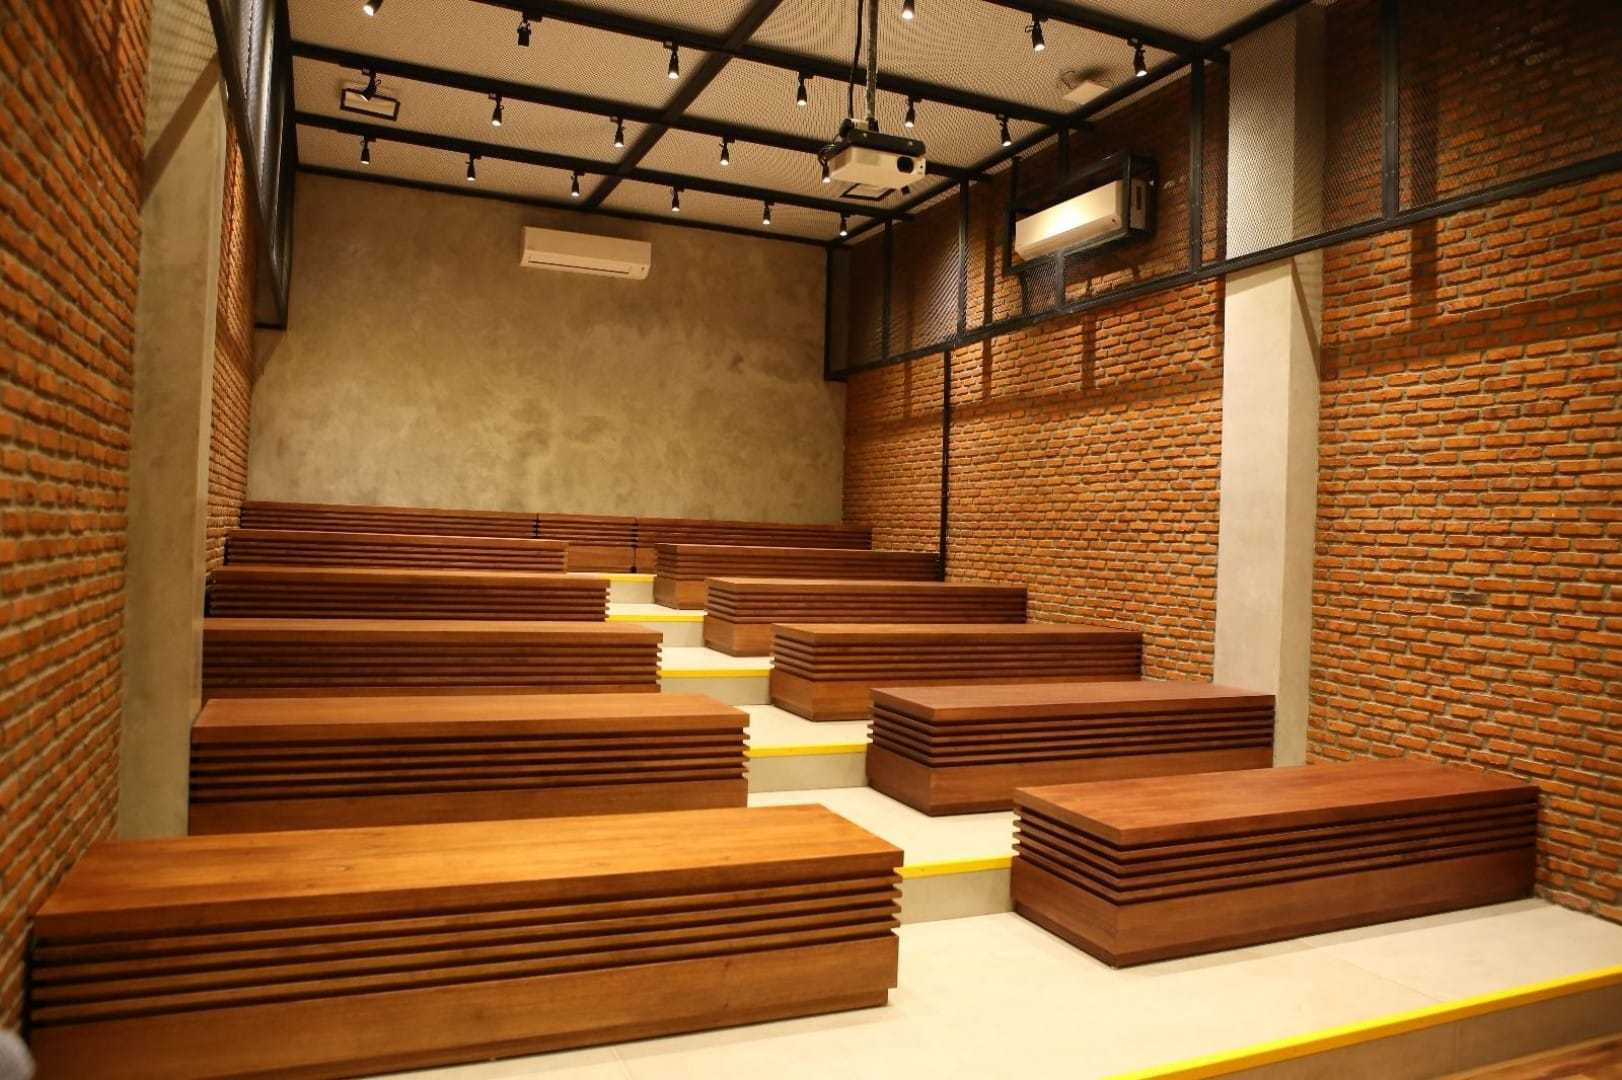 Design & Build By Fabelio.com Uber Jakarta, Daerah Khusus Ibukota Jakarta, Indonesia Jakarta, Daerah Khusus Ibukota Jakarta, Indonesia Function Hall Contemporary 53916